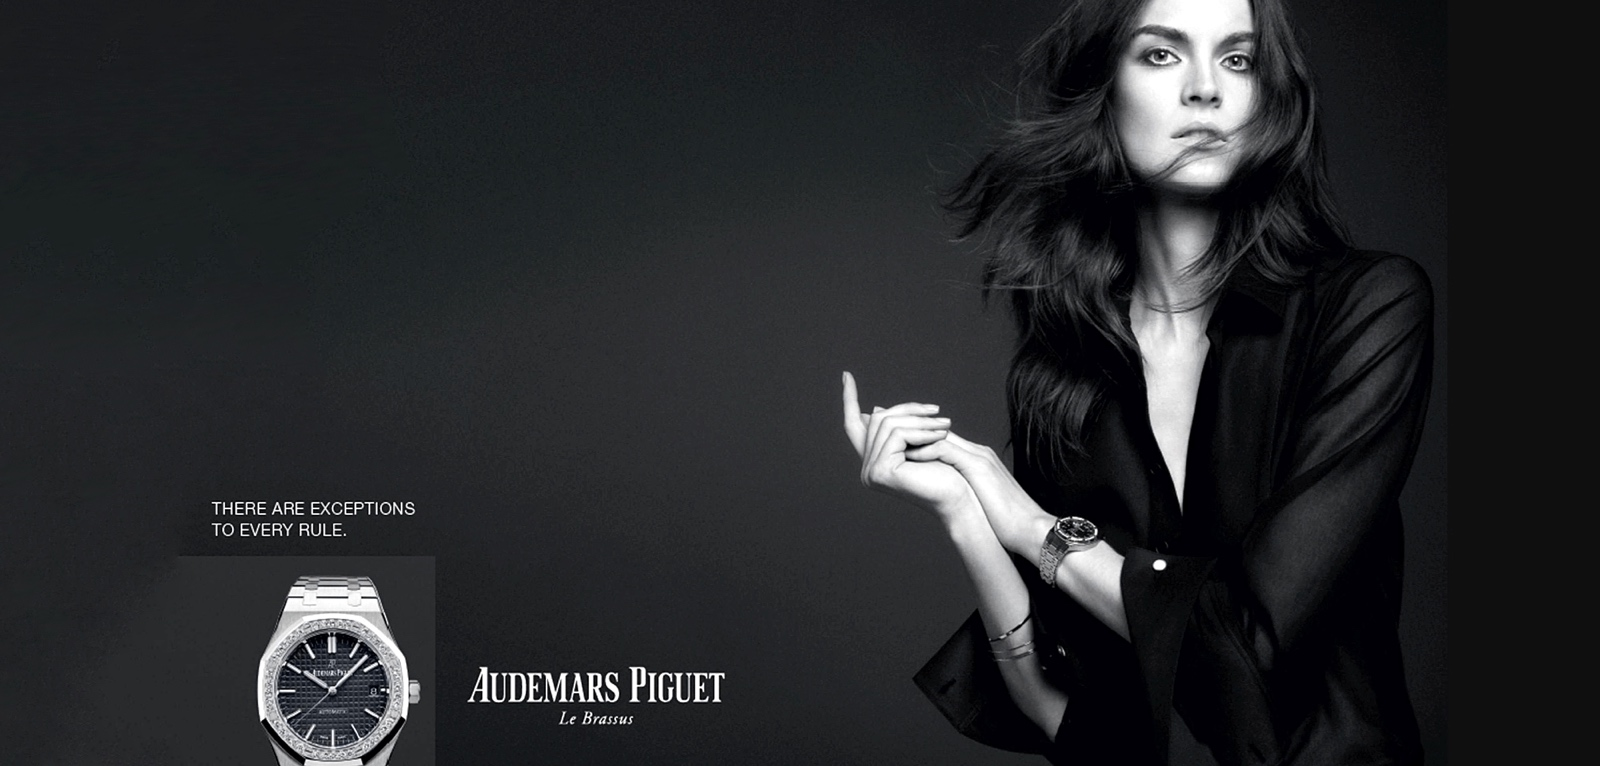 Audemars Piguet new Women campaign cover